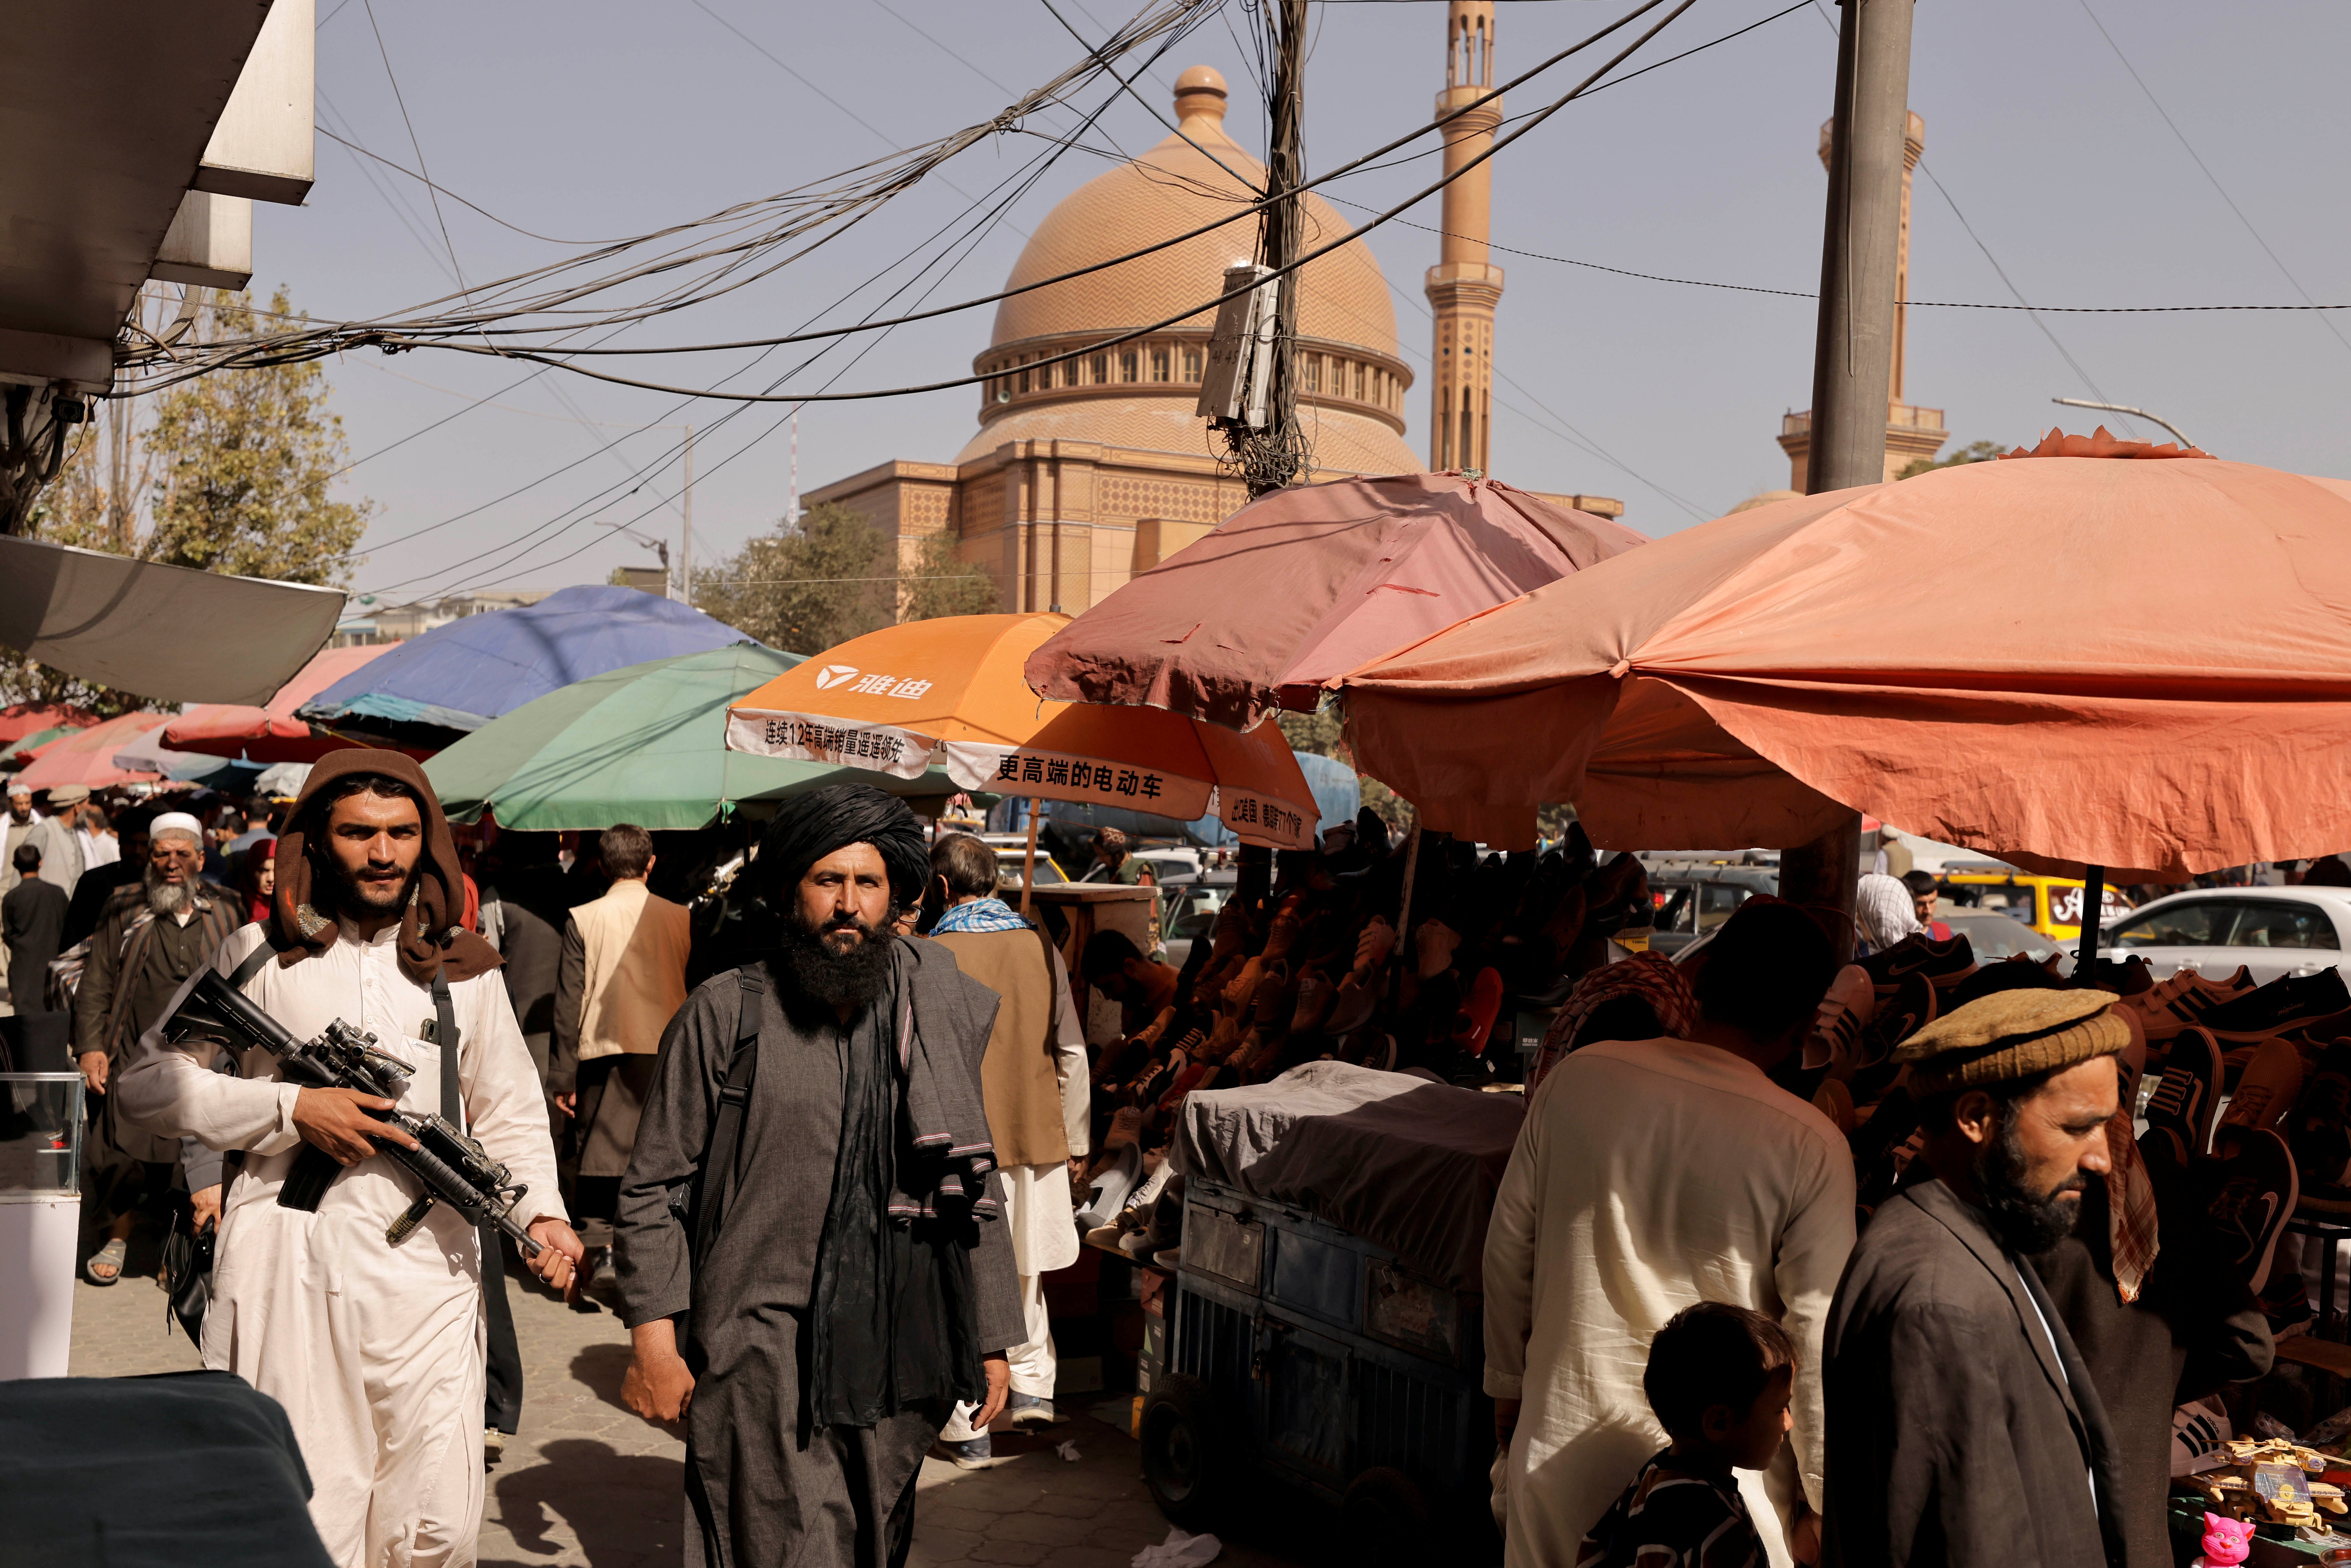 Afghanistan on verge of socio-economic collapse, E.U.'s top diplomat says